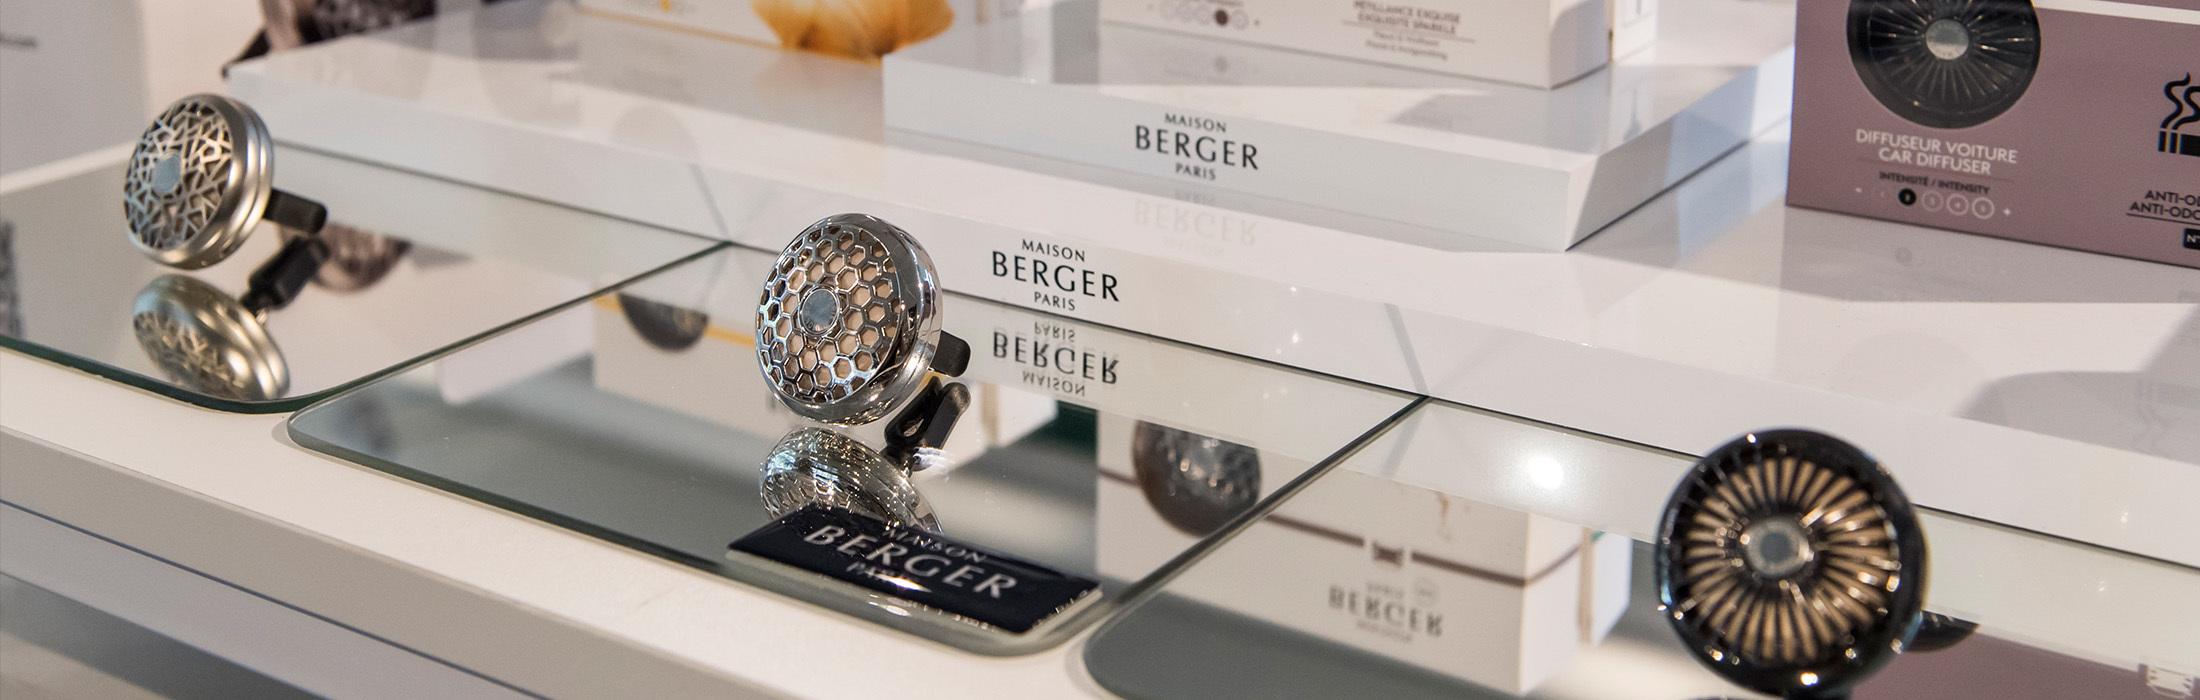 MaisonBerger Parfumverspreiders